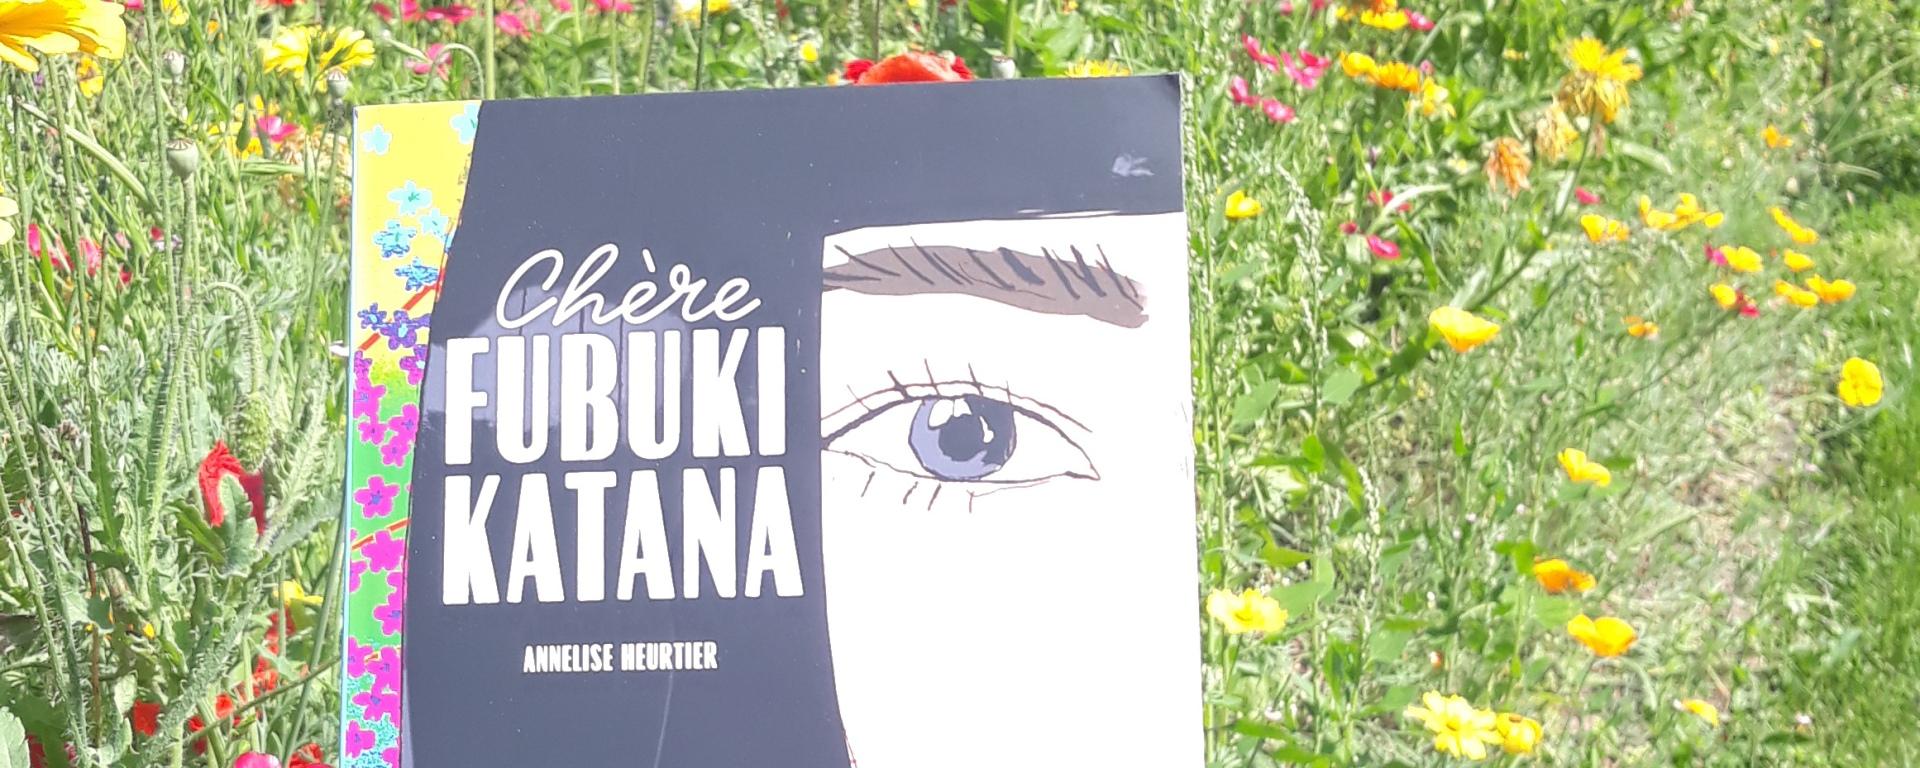 """Chère Fubuki Katana"" d'Annelise Heurtier"